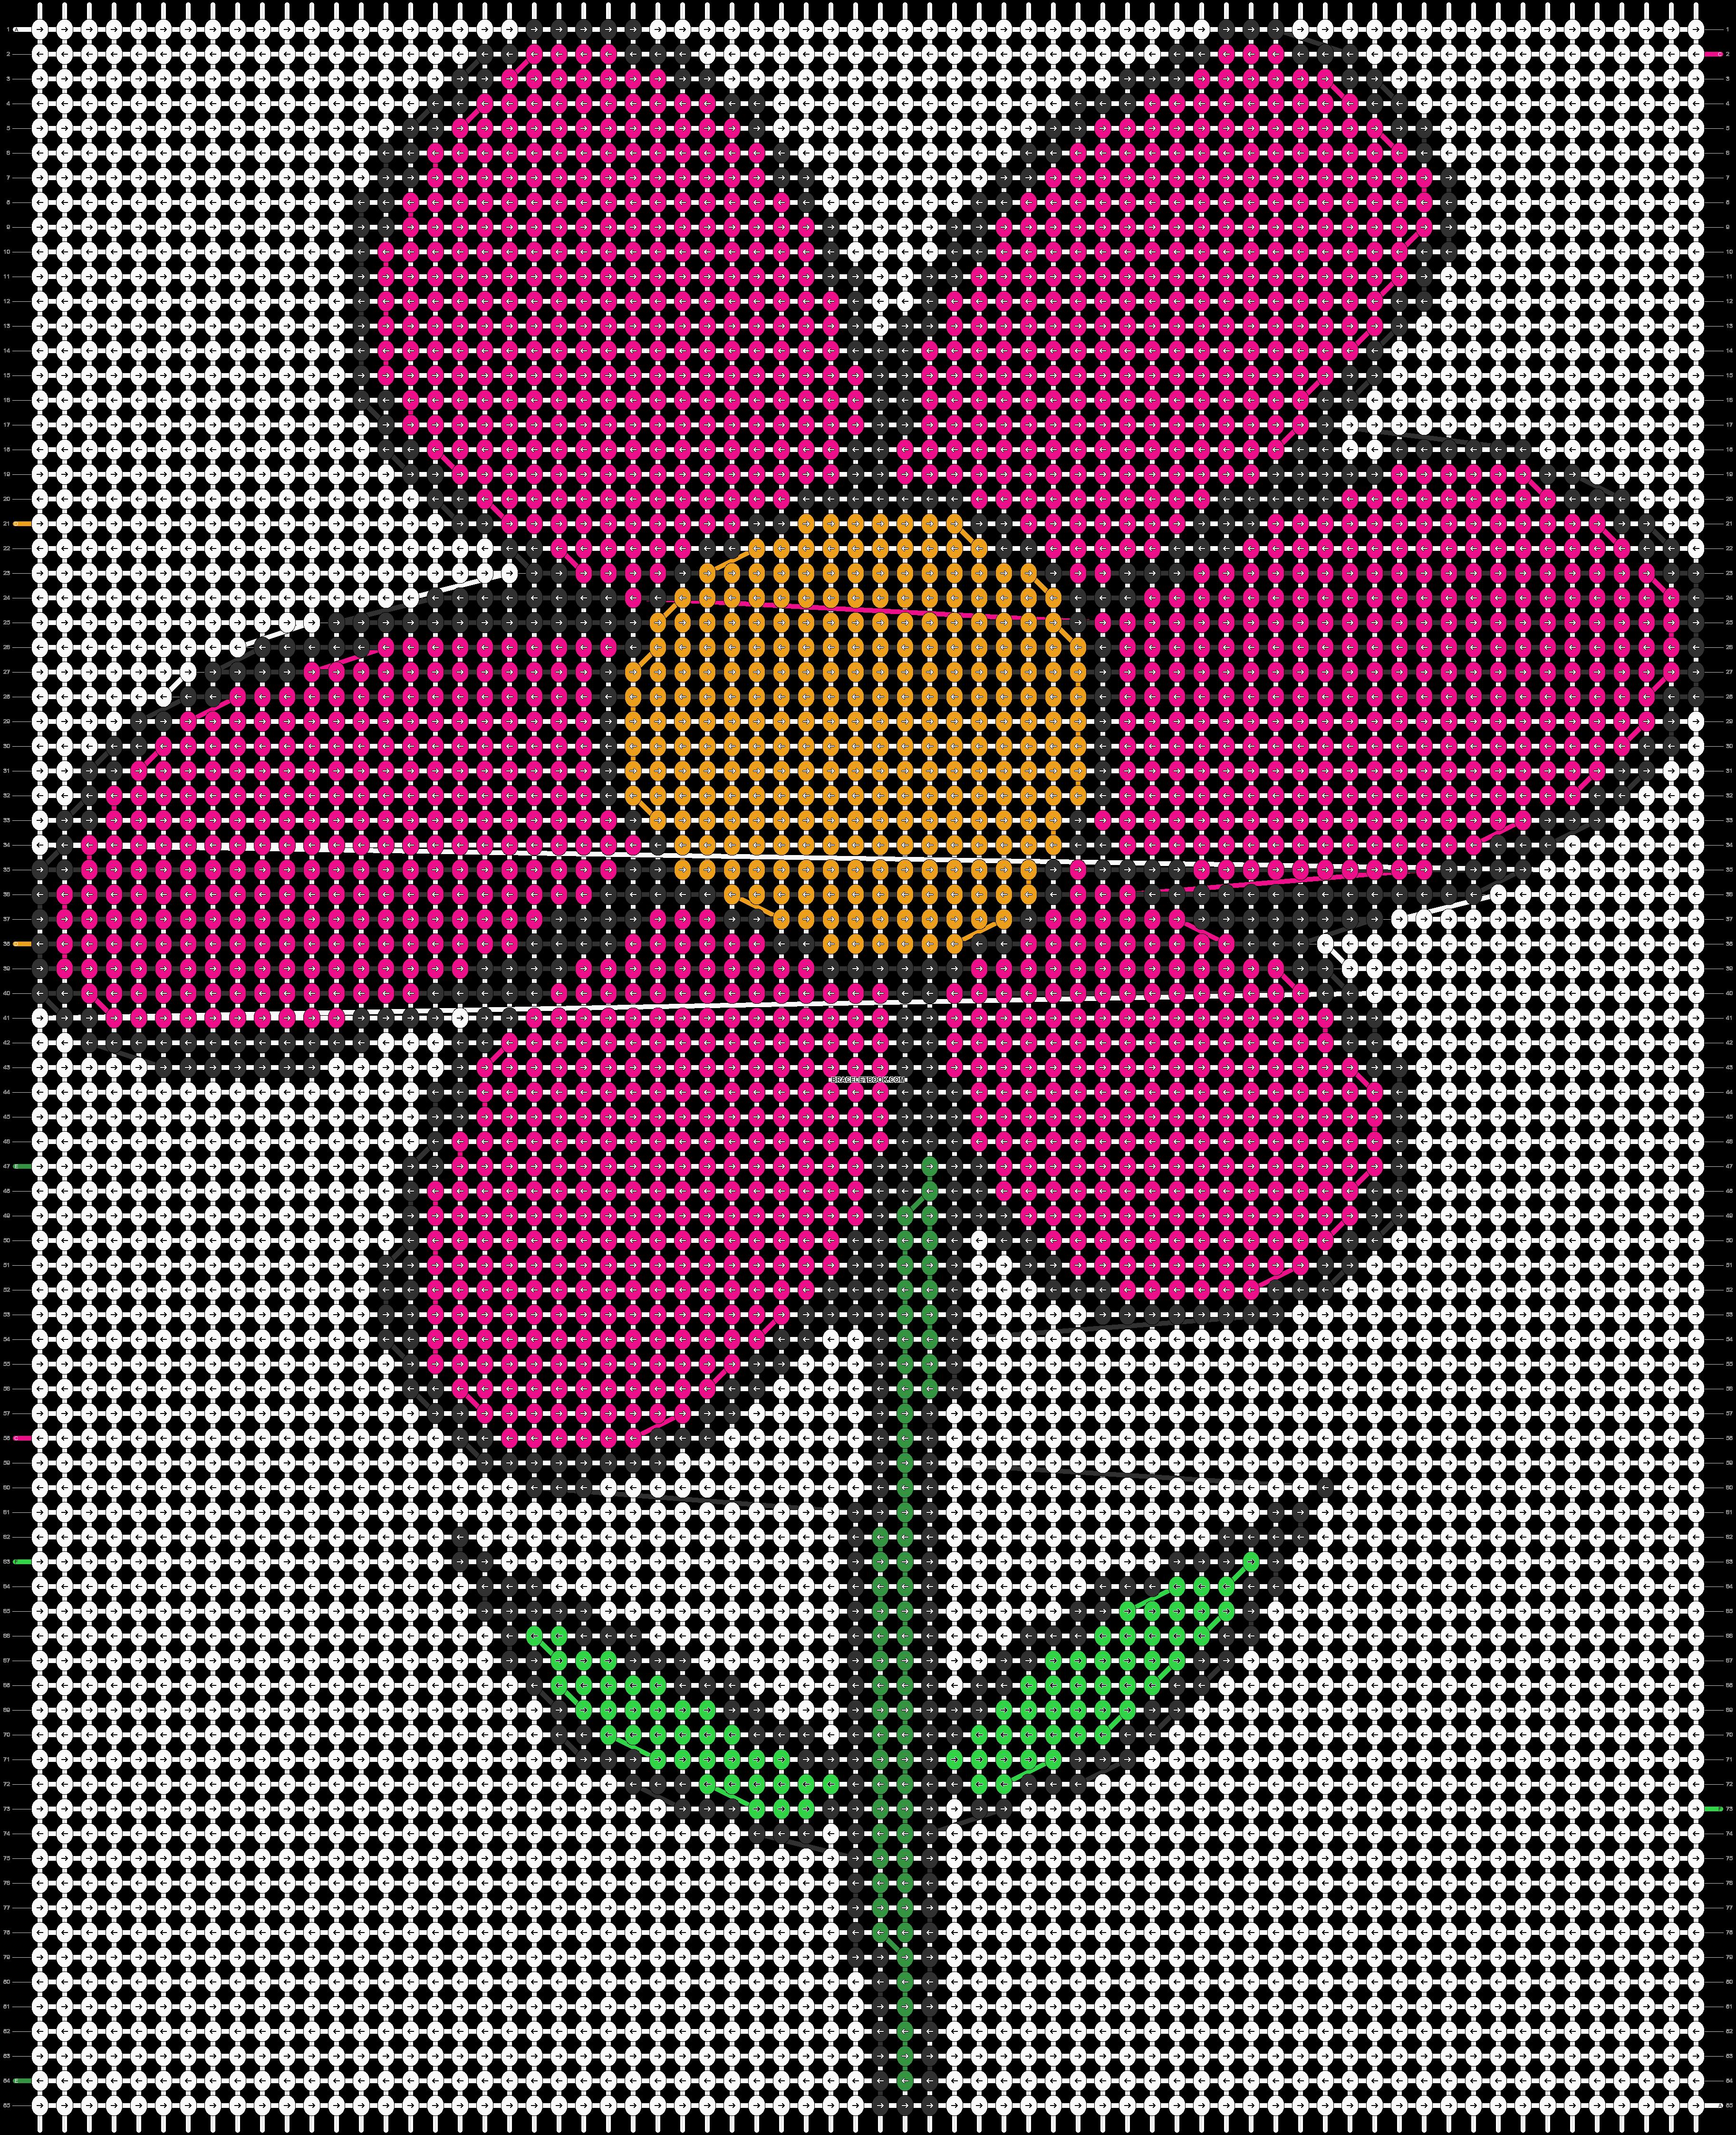 Alpha Pattern #12591 added by mrn1997